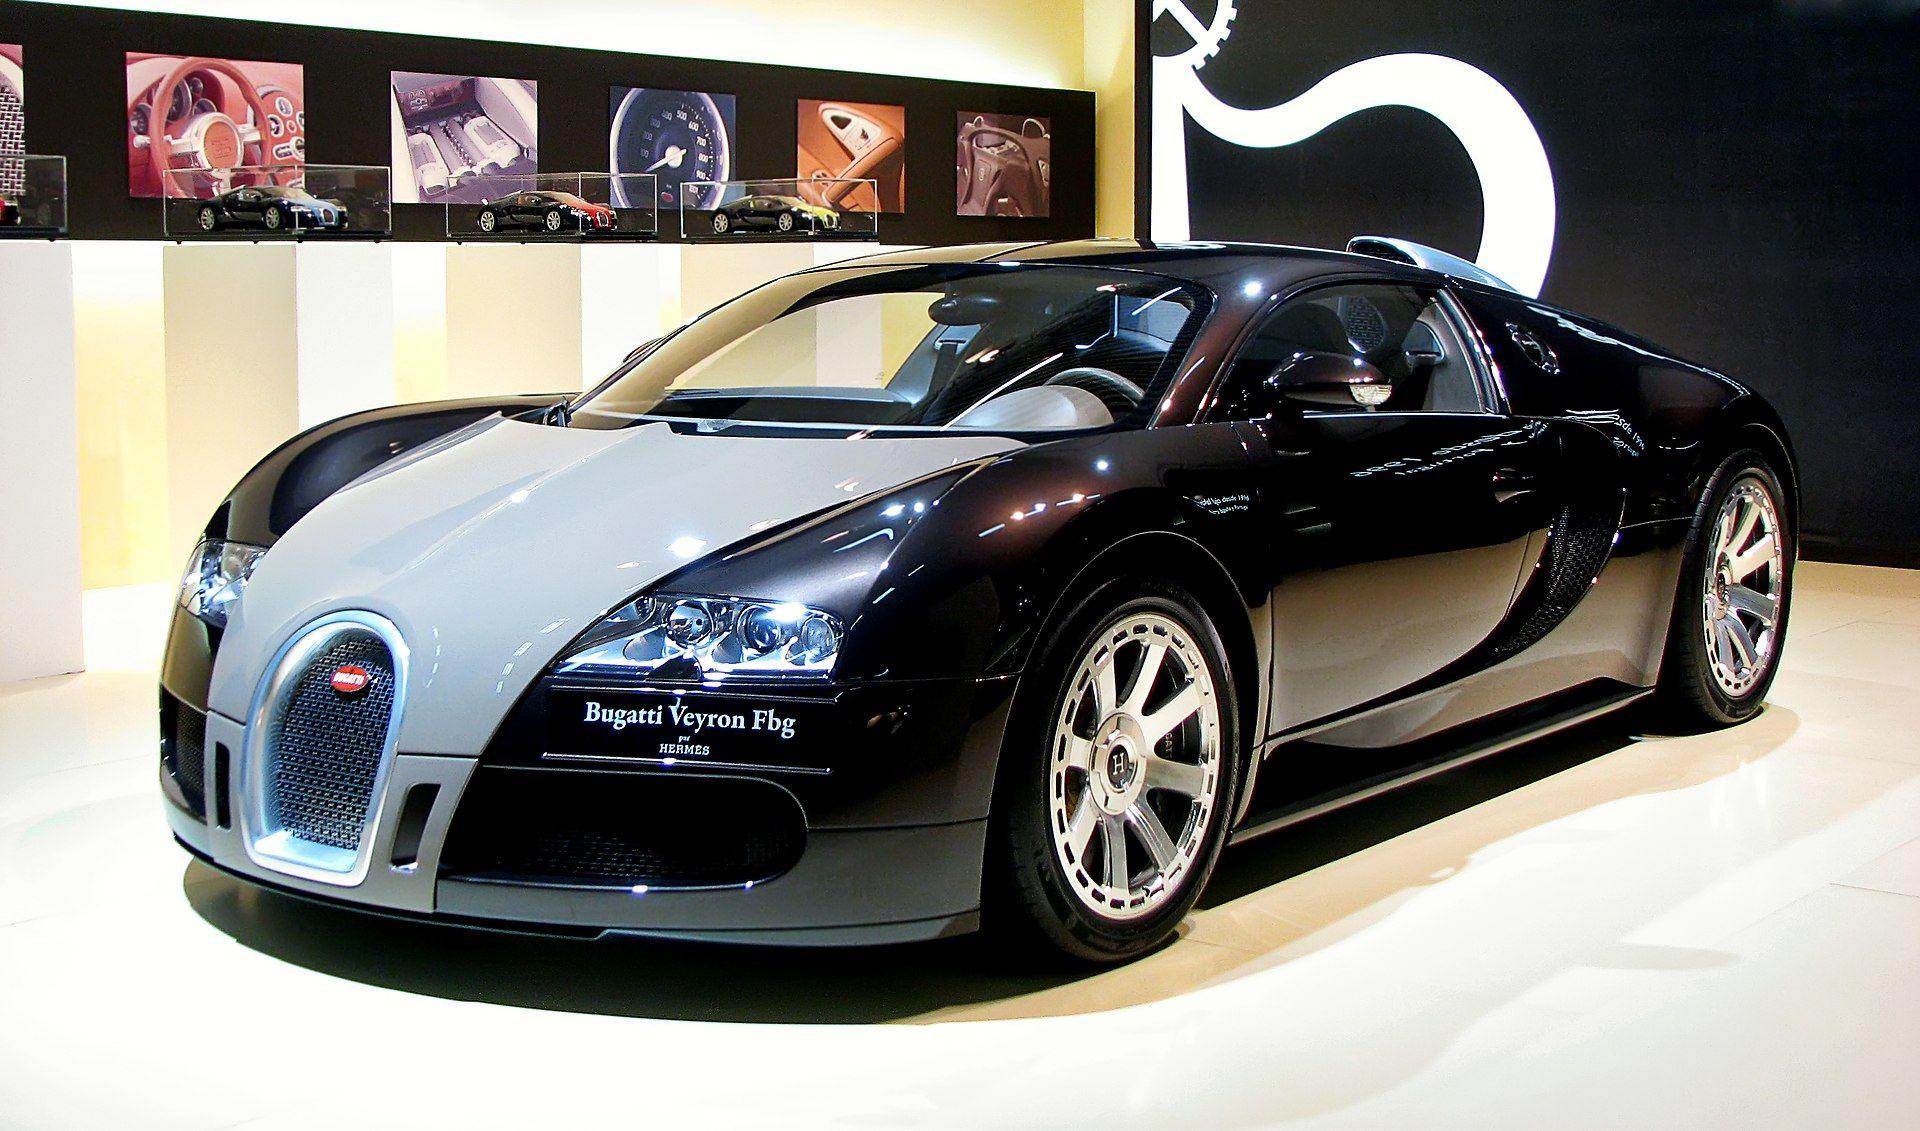 Bugatti Veyron - BCN motorshow 2009 - Bugatti Veyron - Wikipedia #bugattiveyron